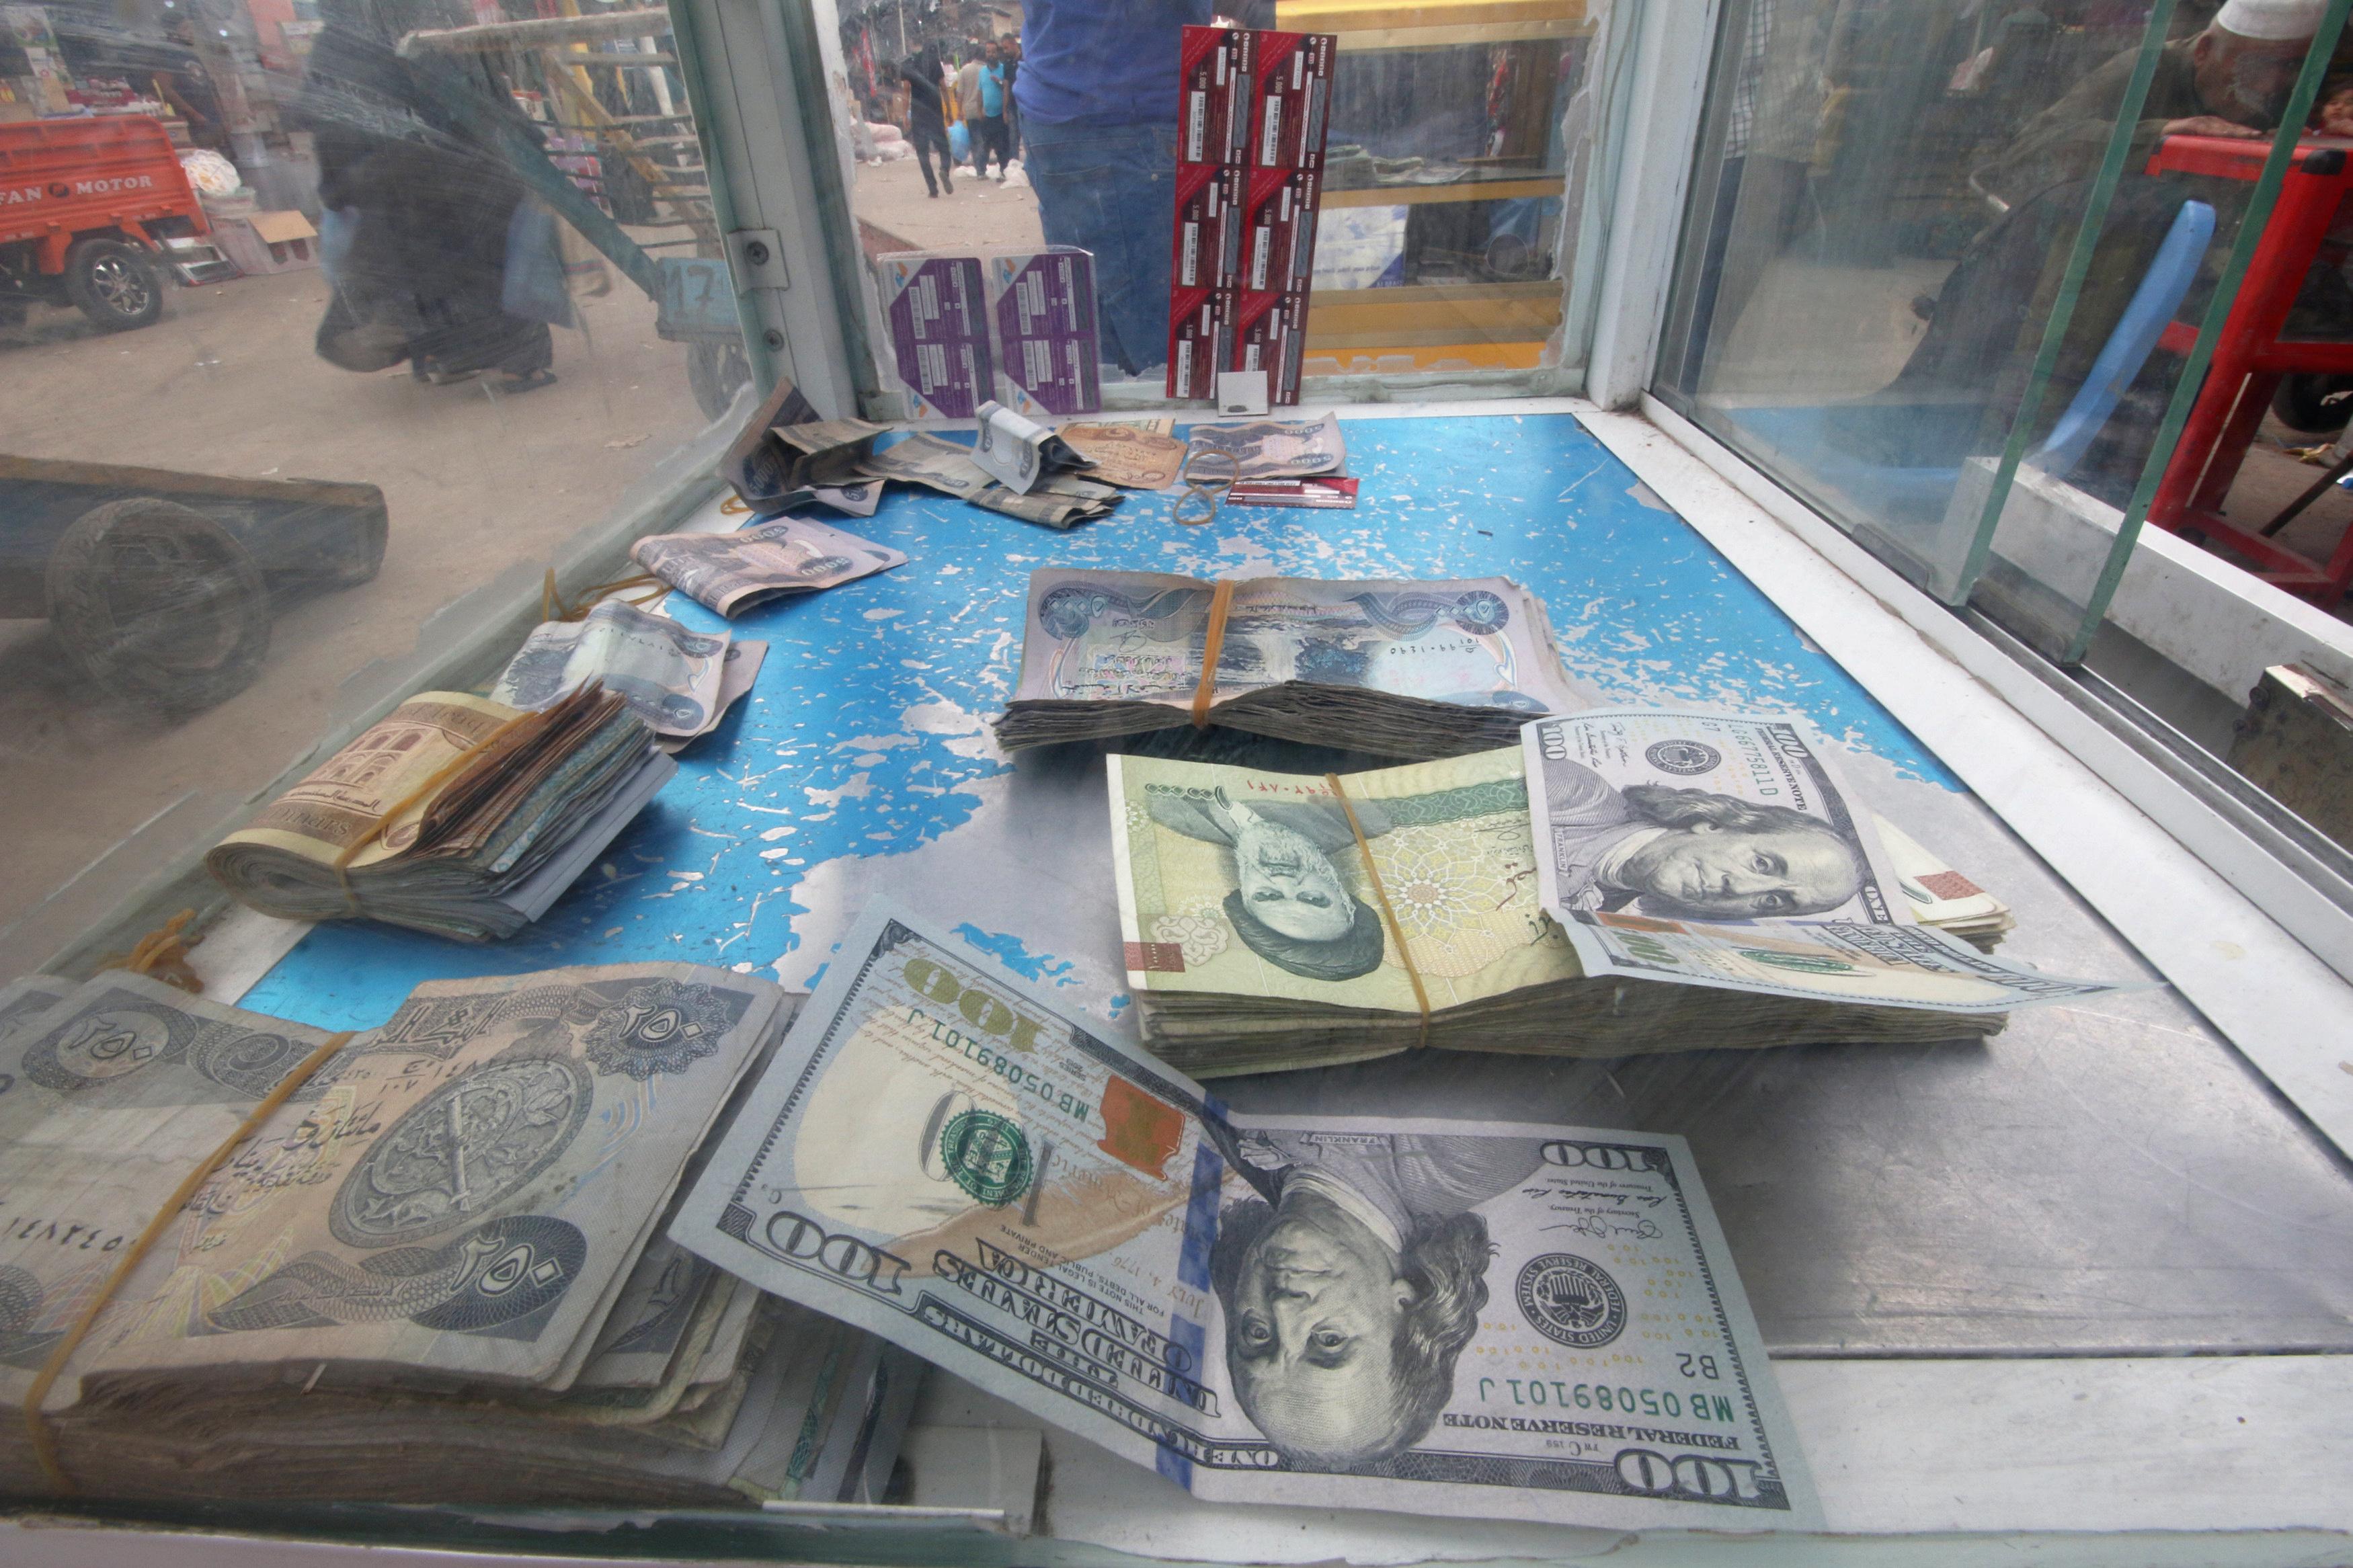 FILE PHOTO: Iranian rials, U.S. dollars and Iraqi dinars are seen at a currency exchange shopÊin Basra, Iraq November 3, 2018. REUTERS/Essam al-Sudani